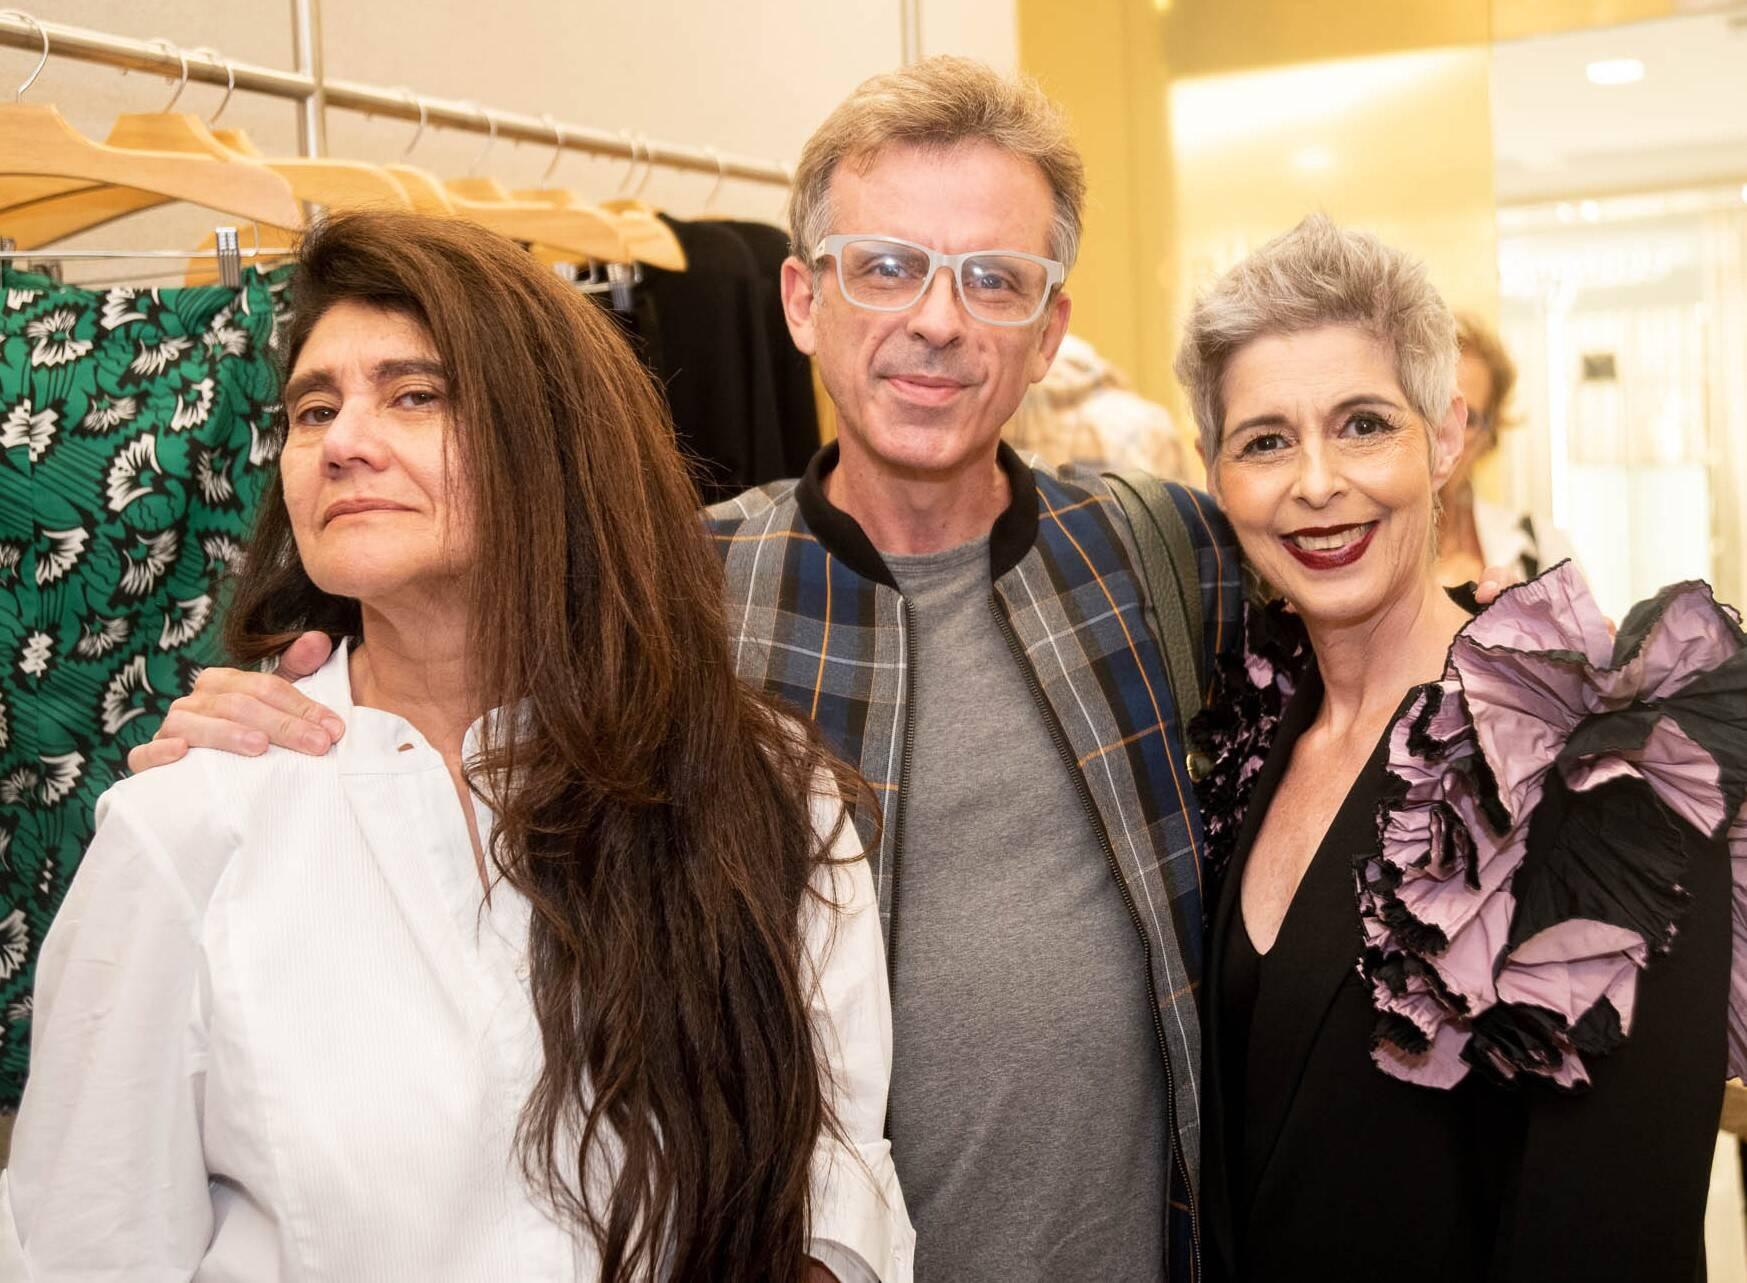 Sonia Gonçalves, Alexandre Schnabl e Roberta Ribeiro /Foto: Renato Wrobel